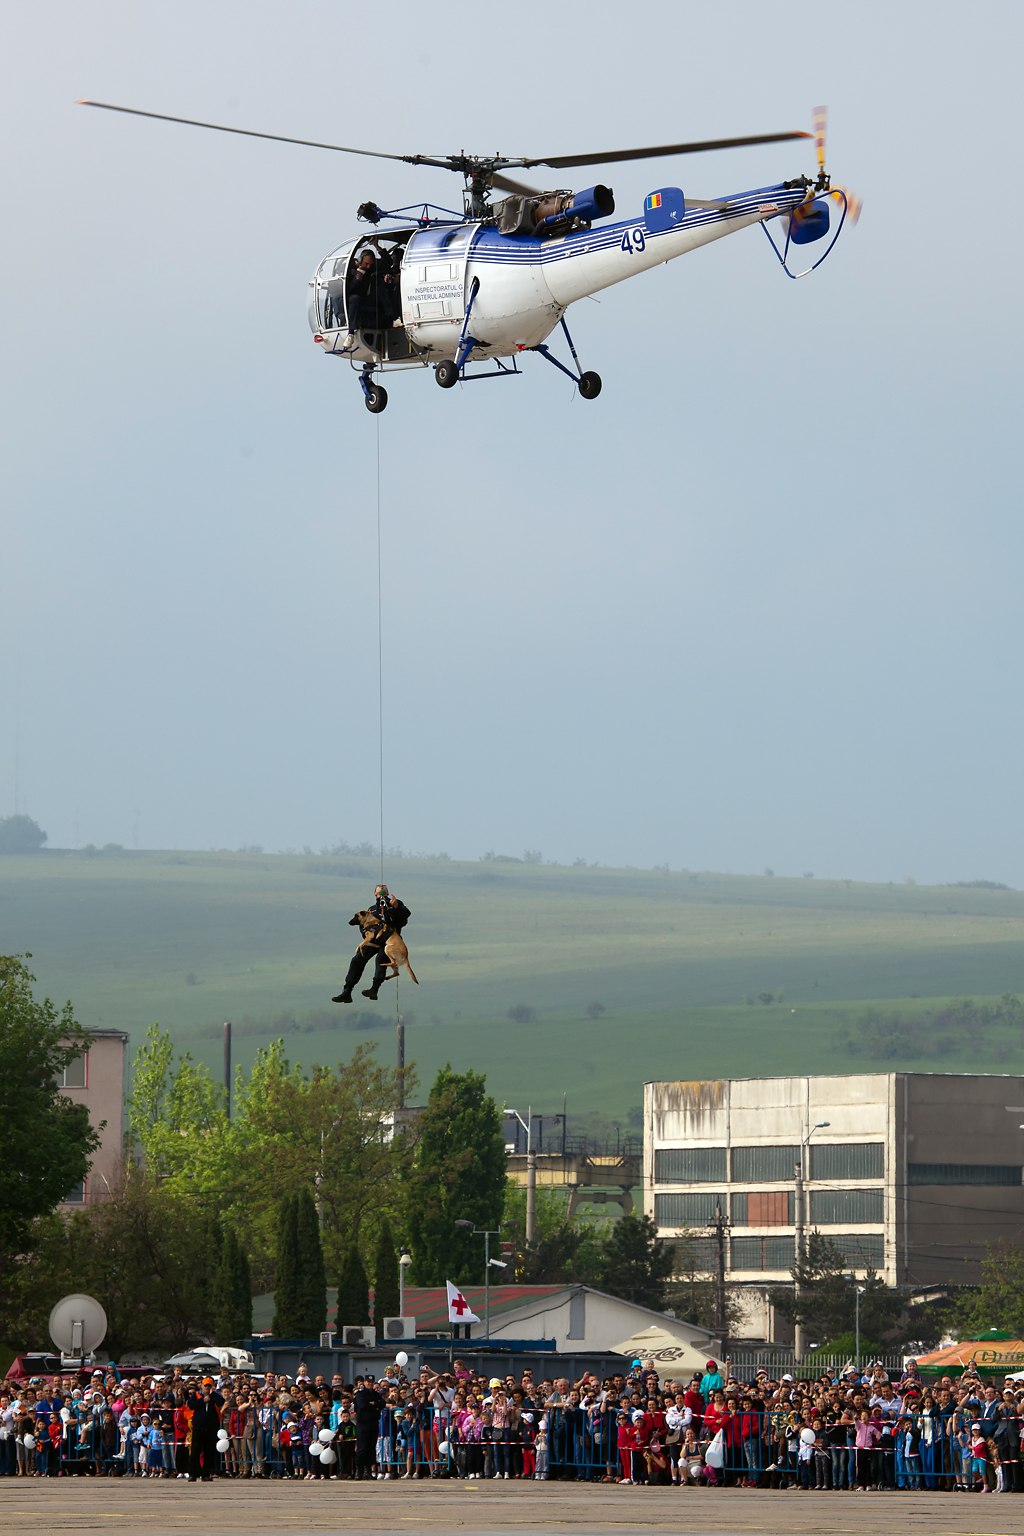 Cluj Napoca Airshow - 5 mai 2012 - Poze - Pagina 2 05